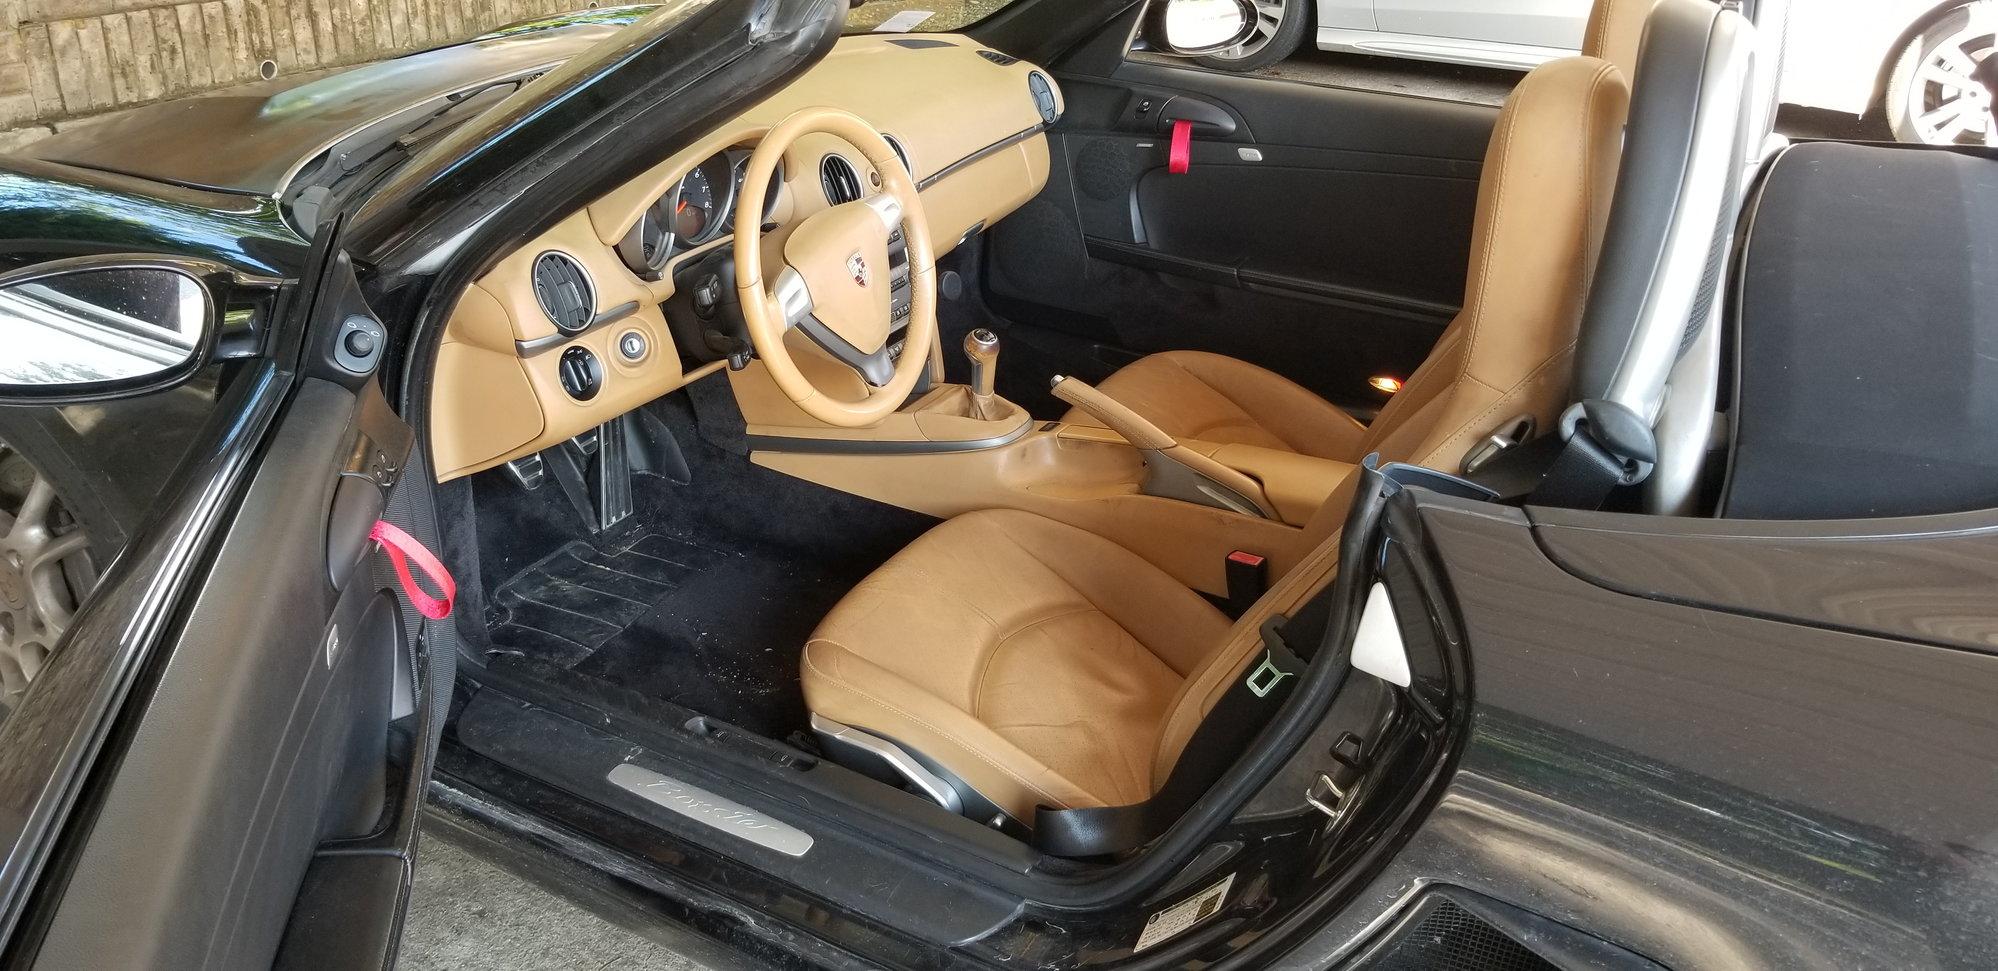 Project Boxster almost complete - two tone interior, suspension, etc